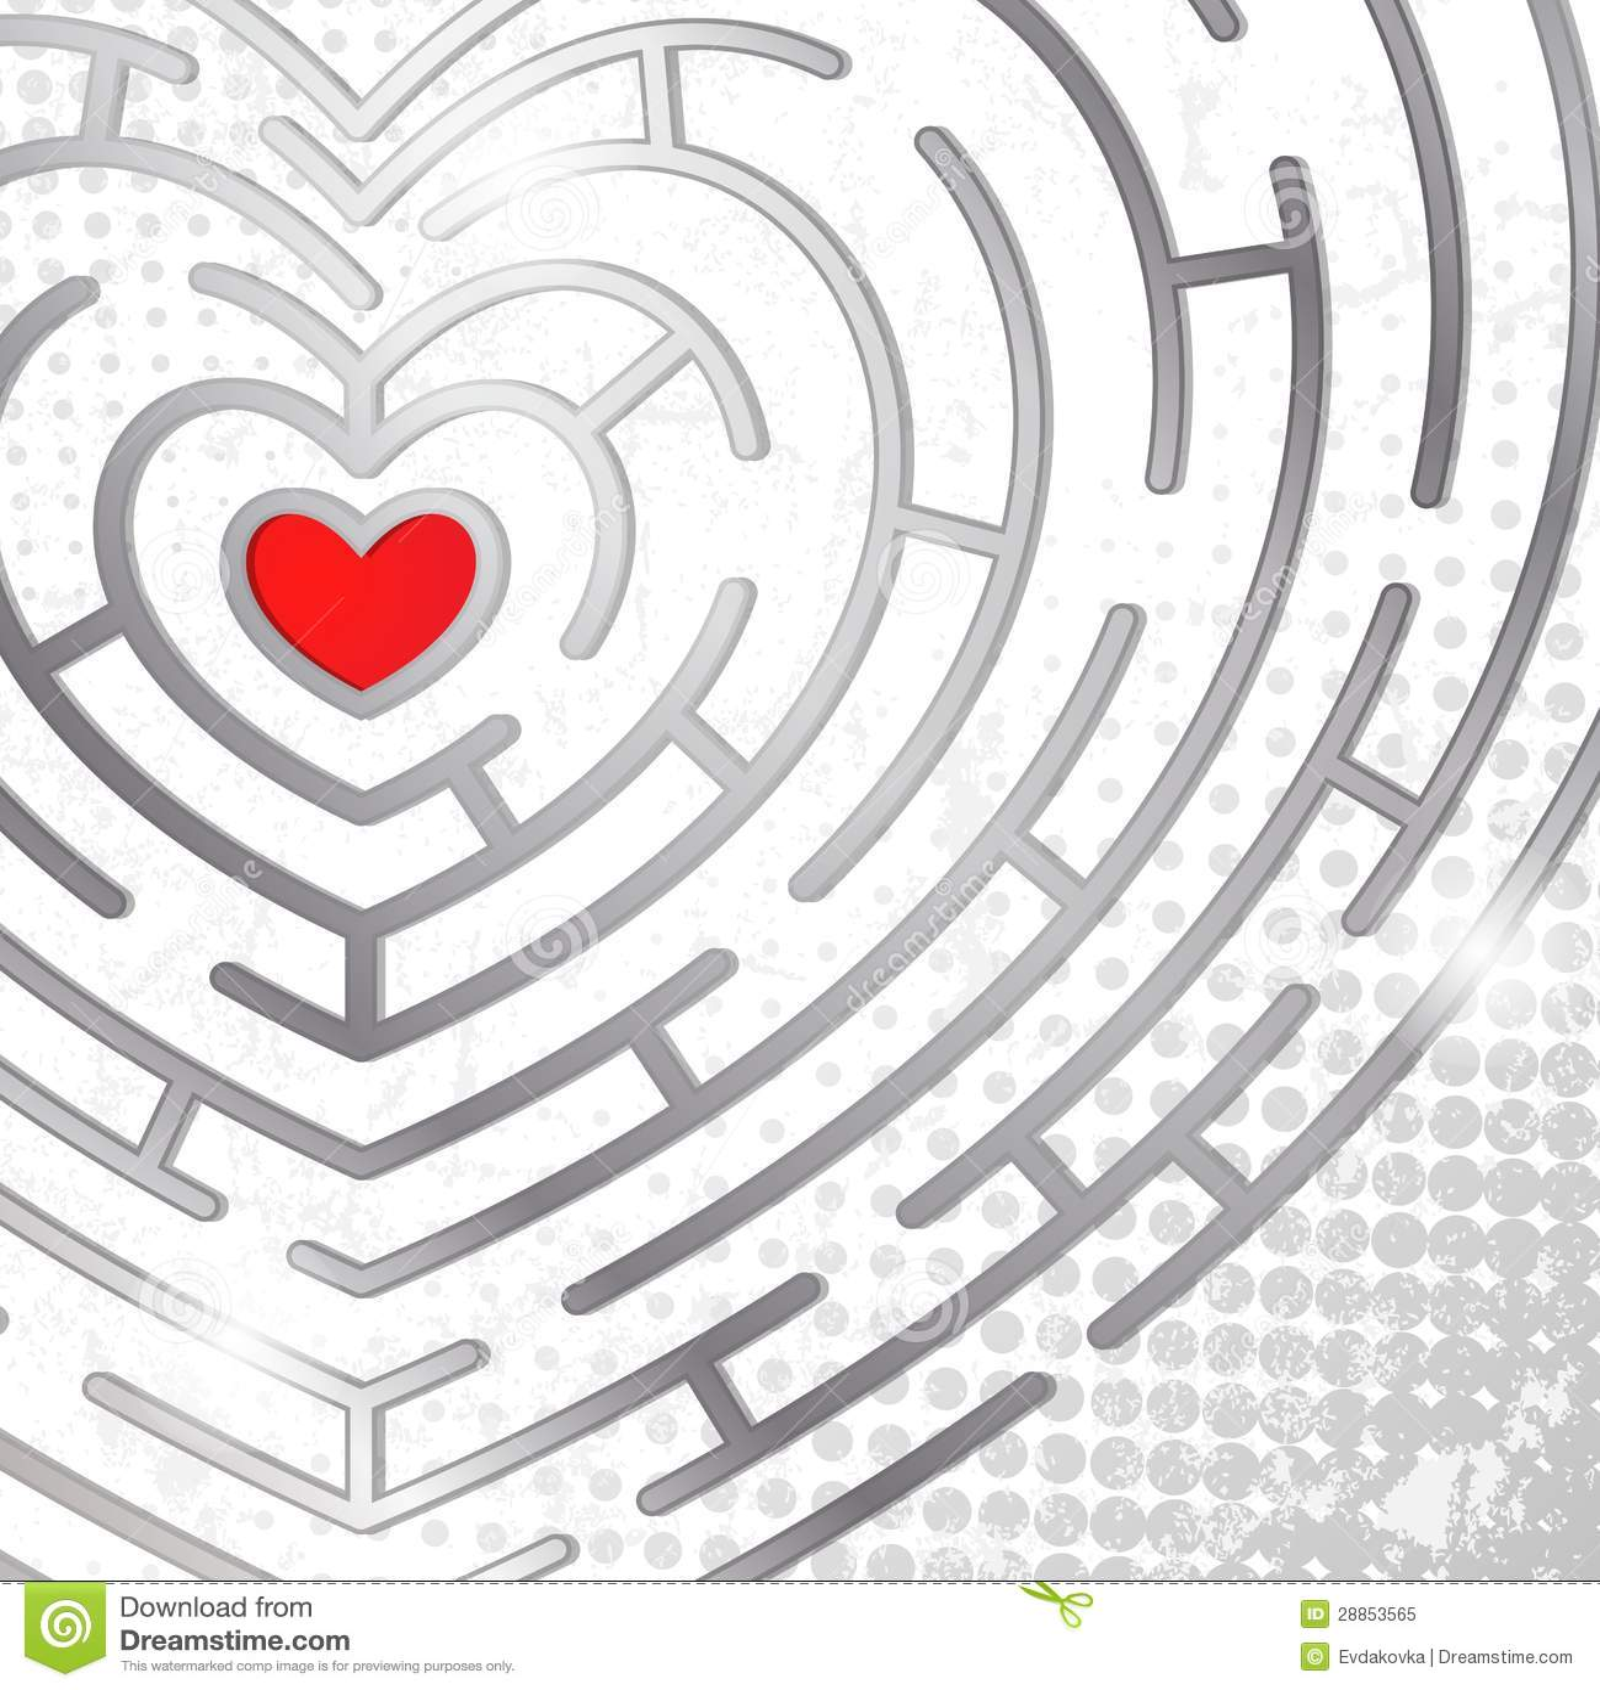 Maze Whits Heart Royalty Free Stock Photo - Image: 28853565